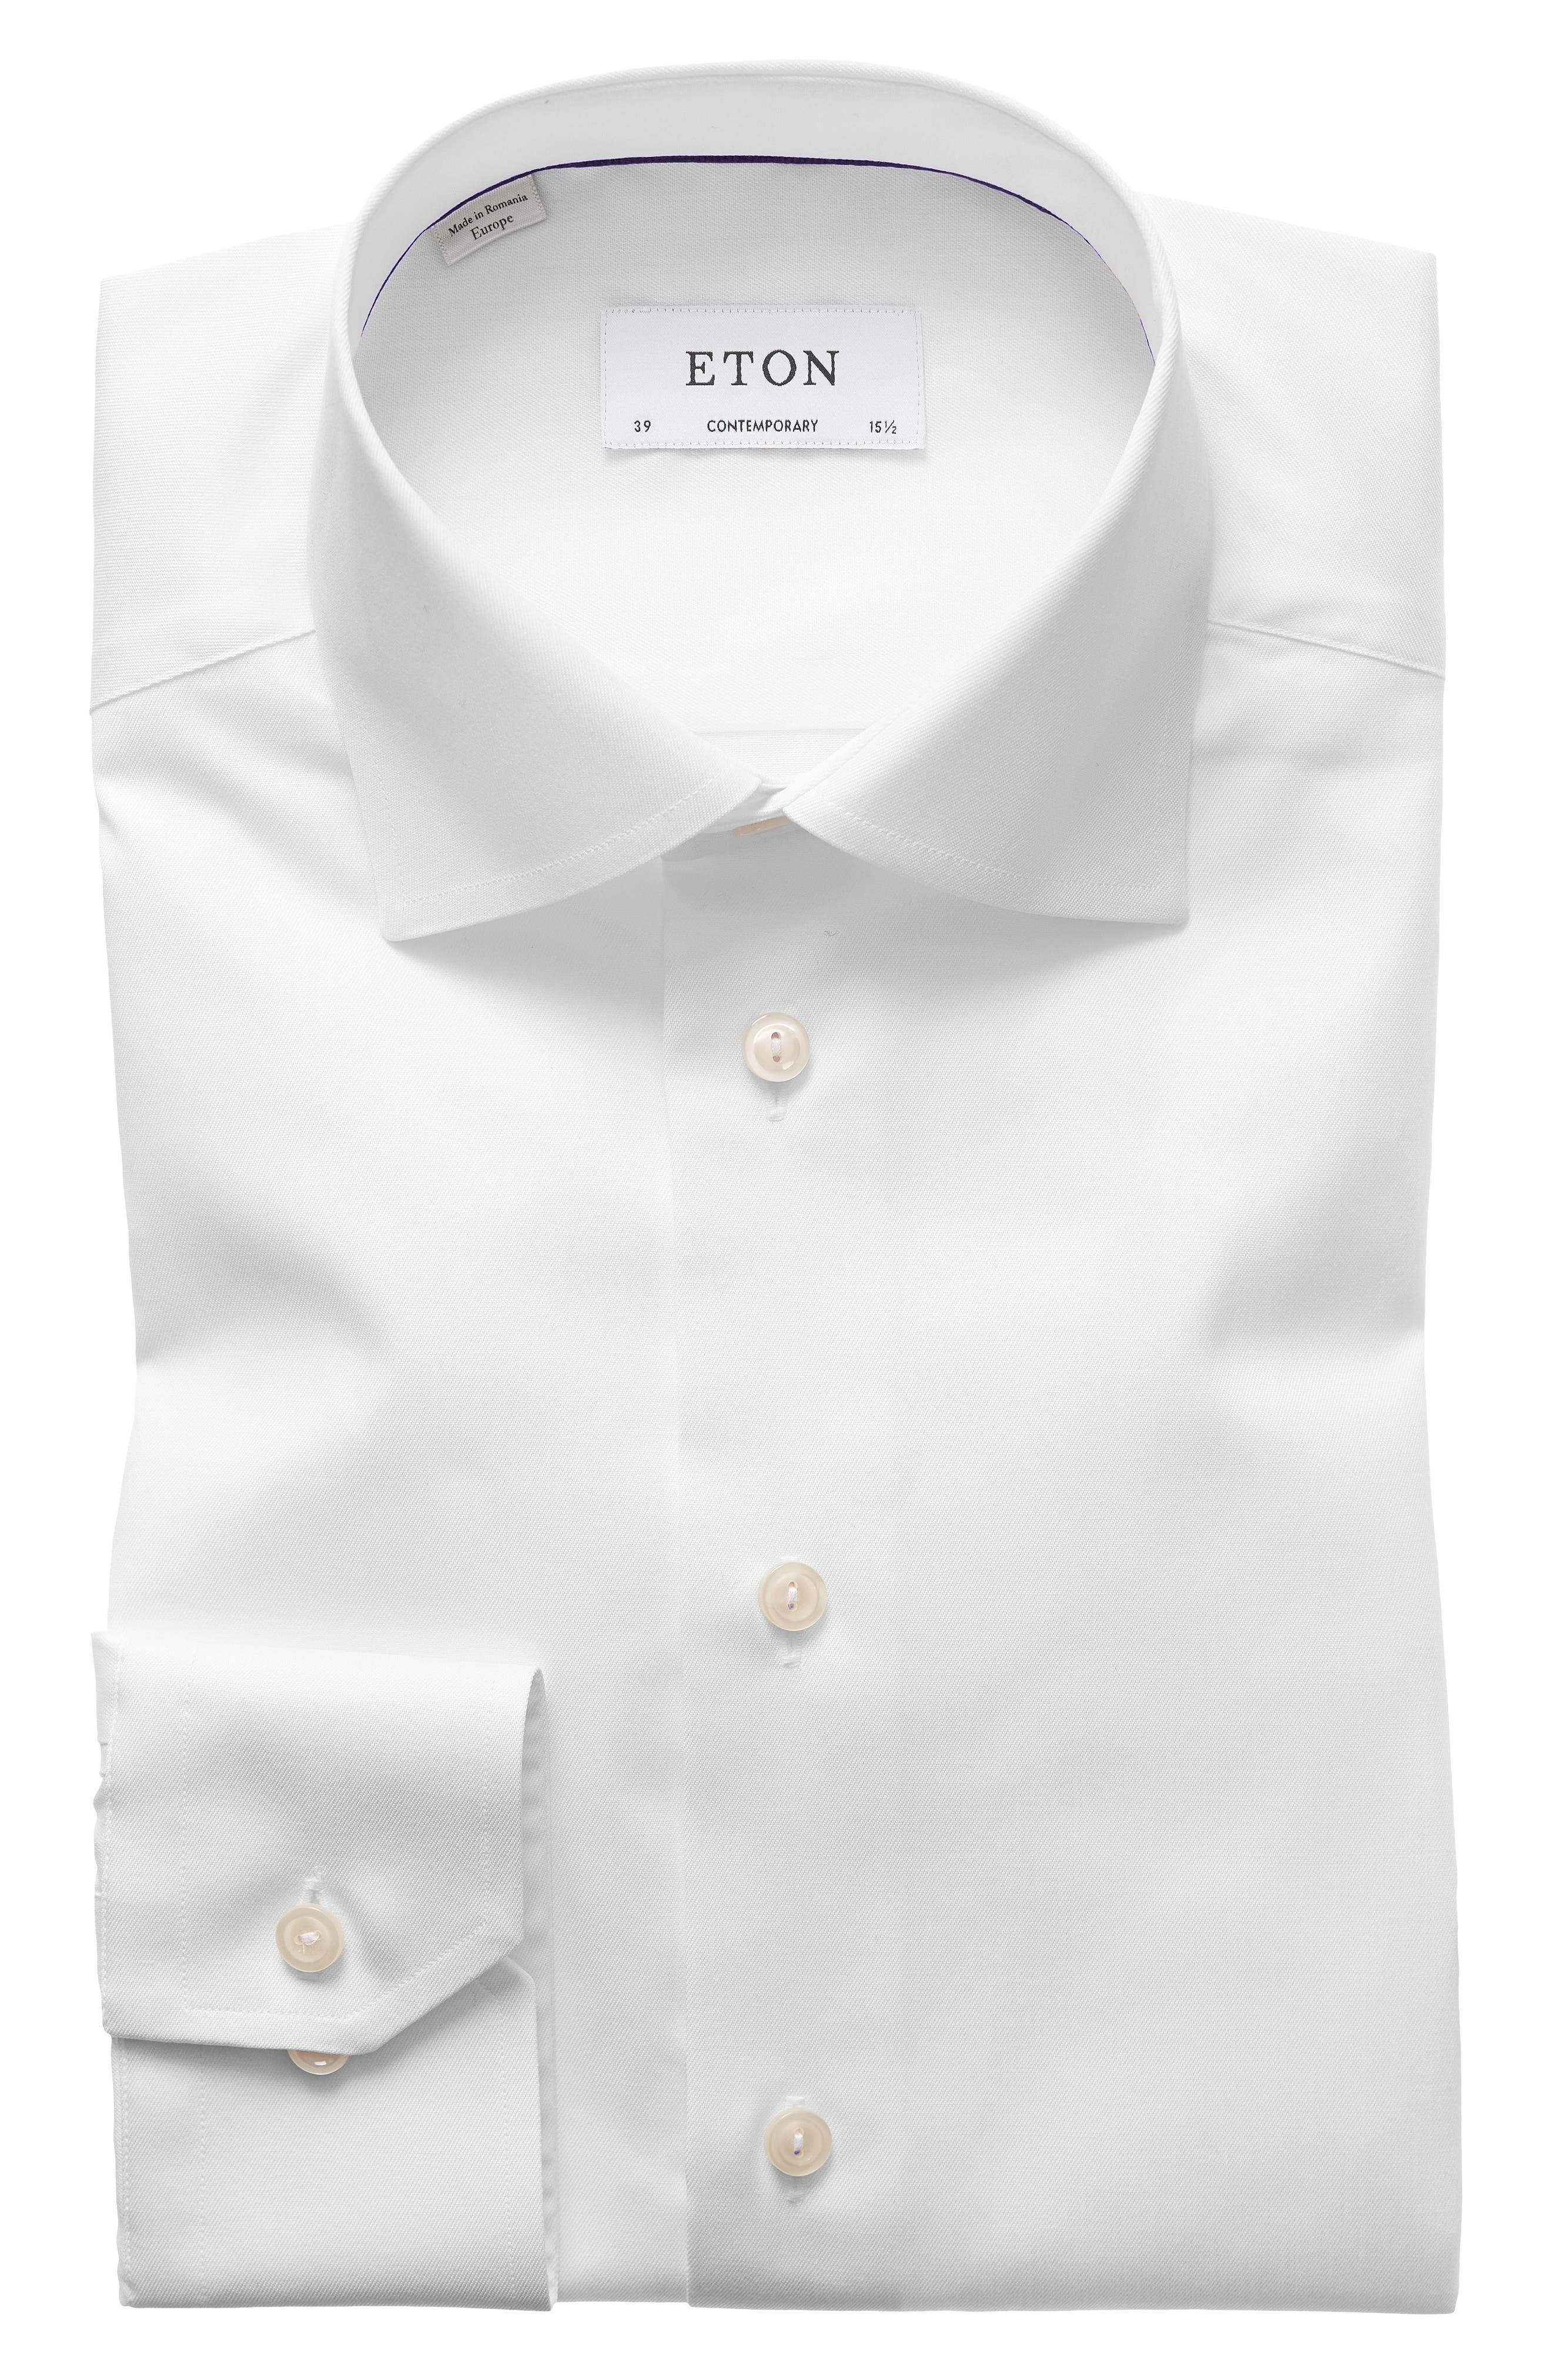 Eton Of Sweden Signature Twill Regular Fit Dress Shirt In White